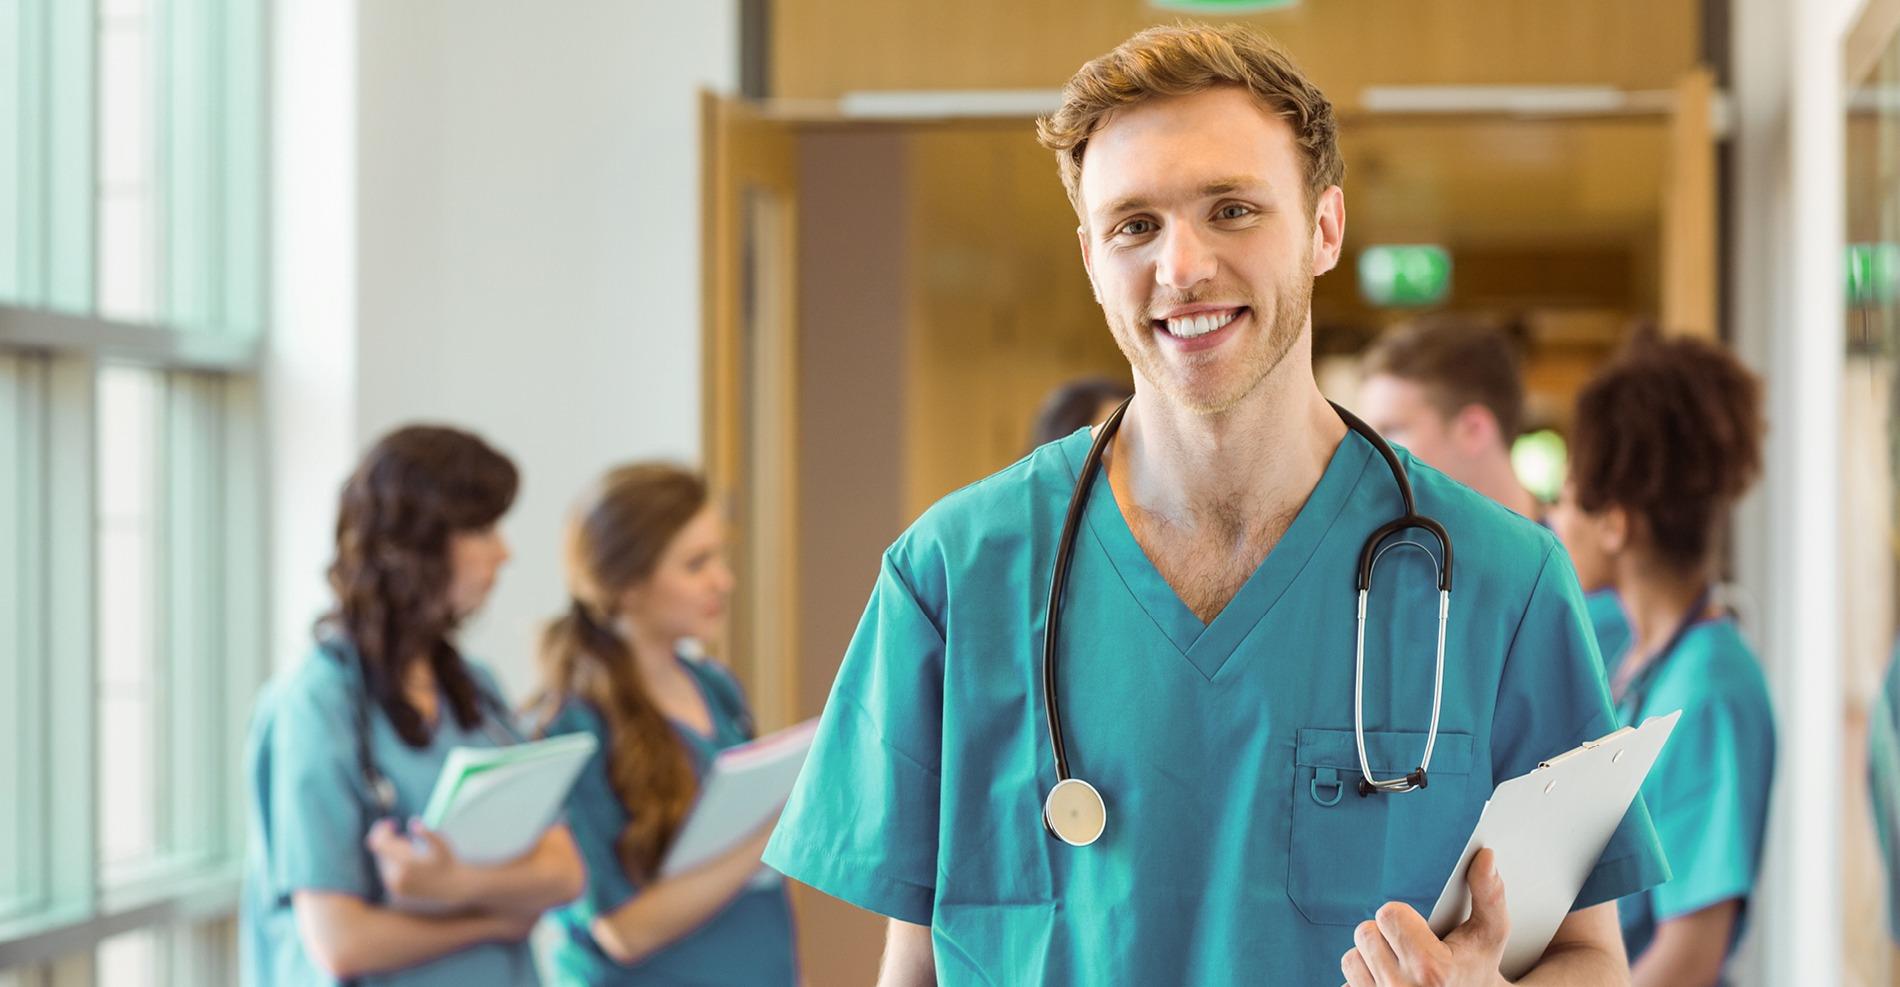 prácticas sanitarias en hospitales por toda España